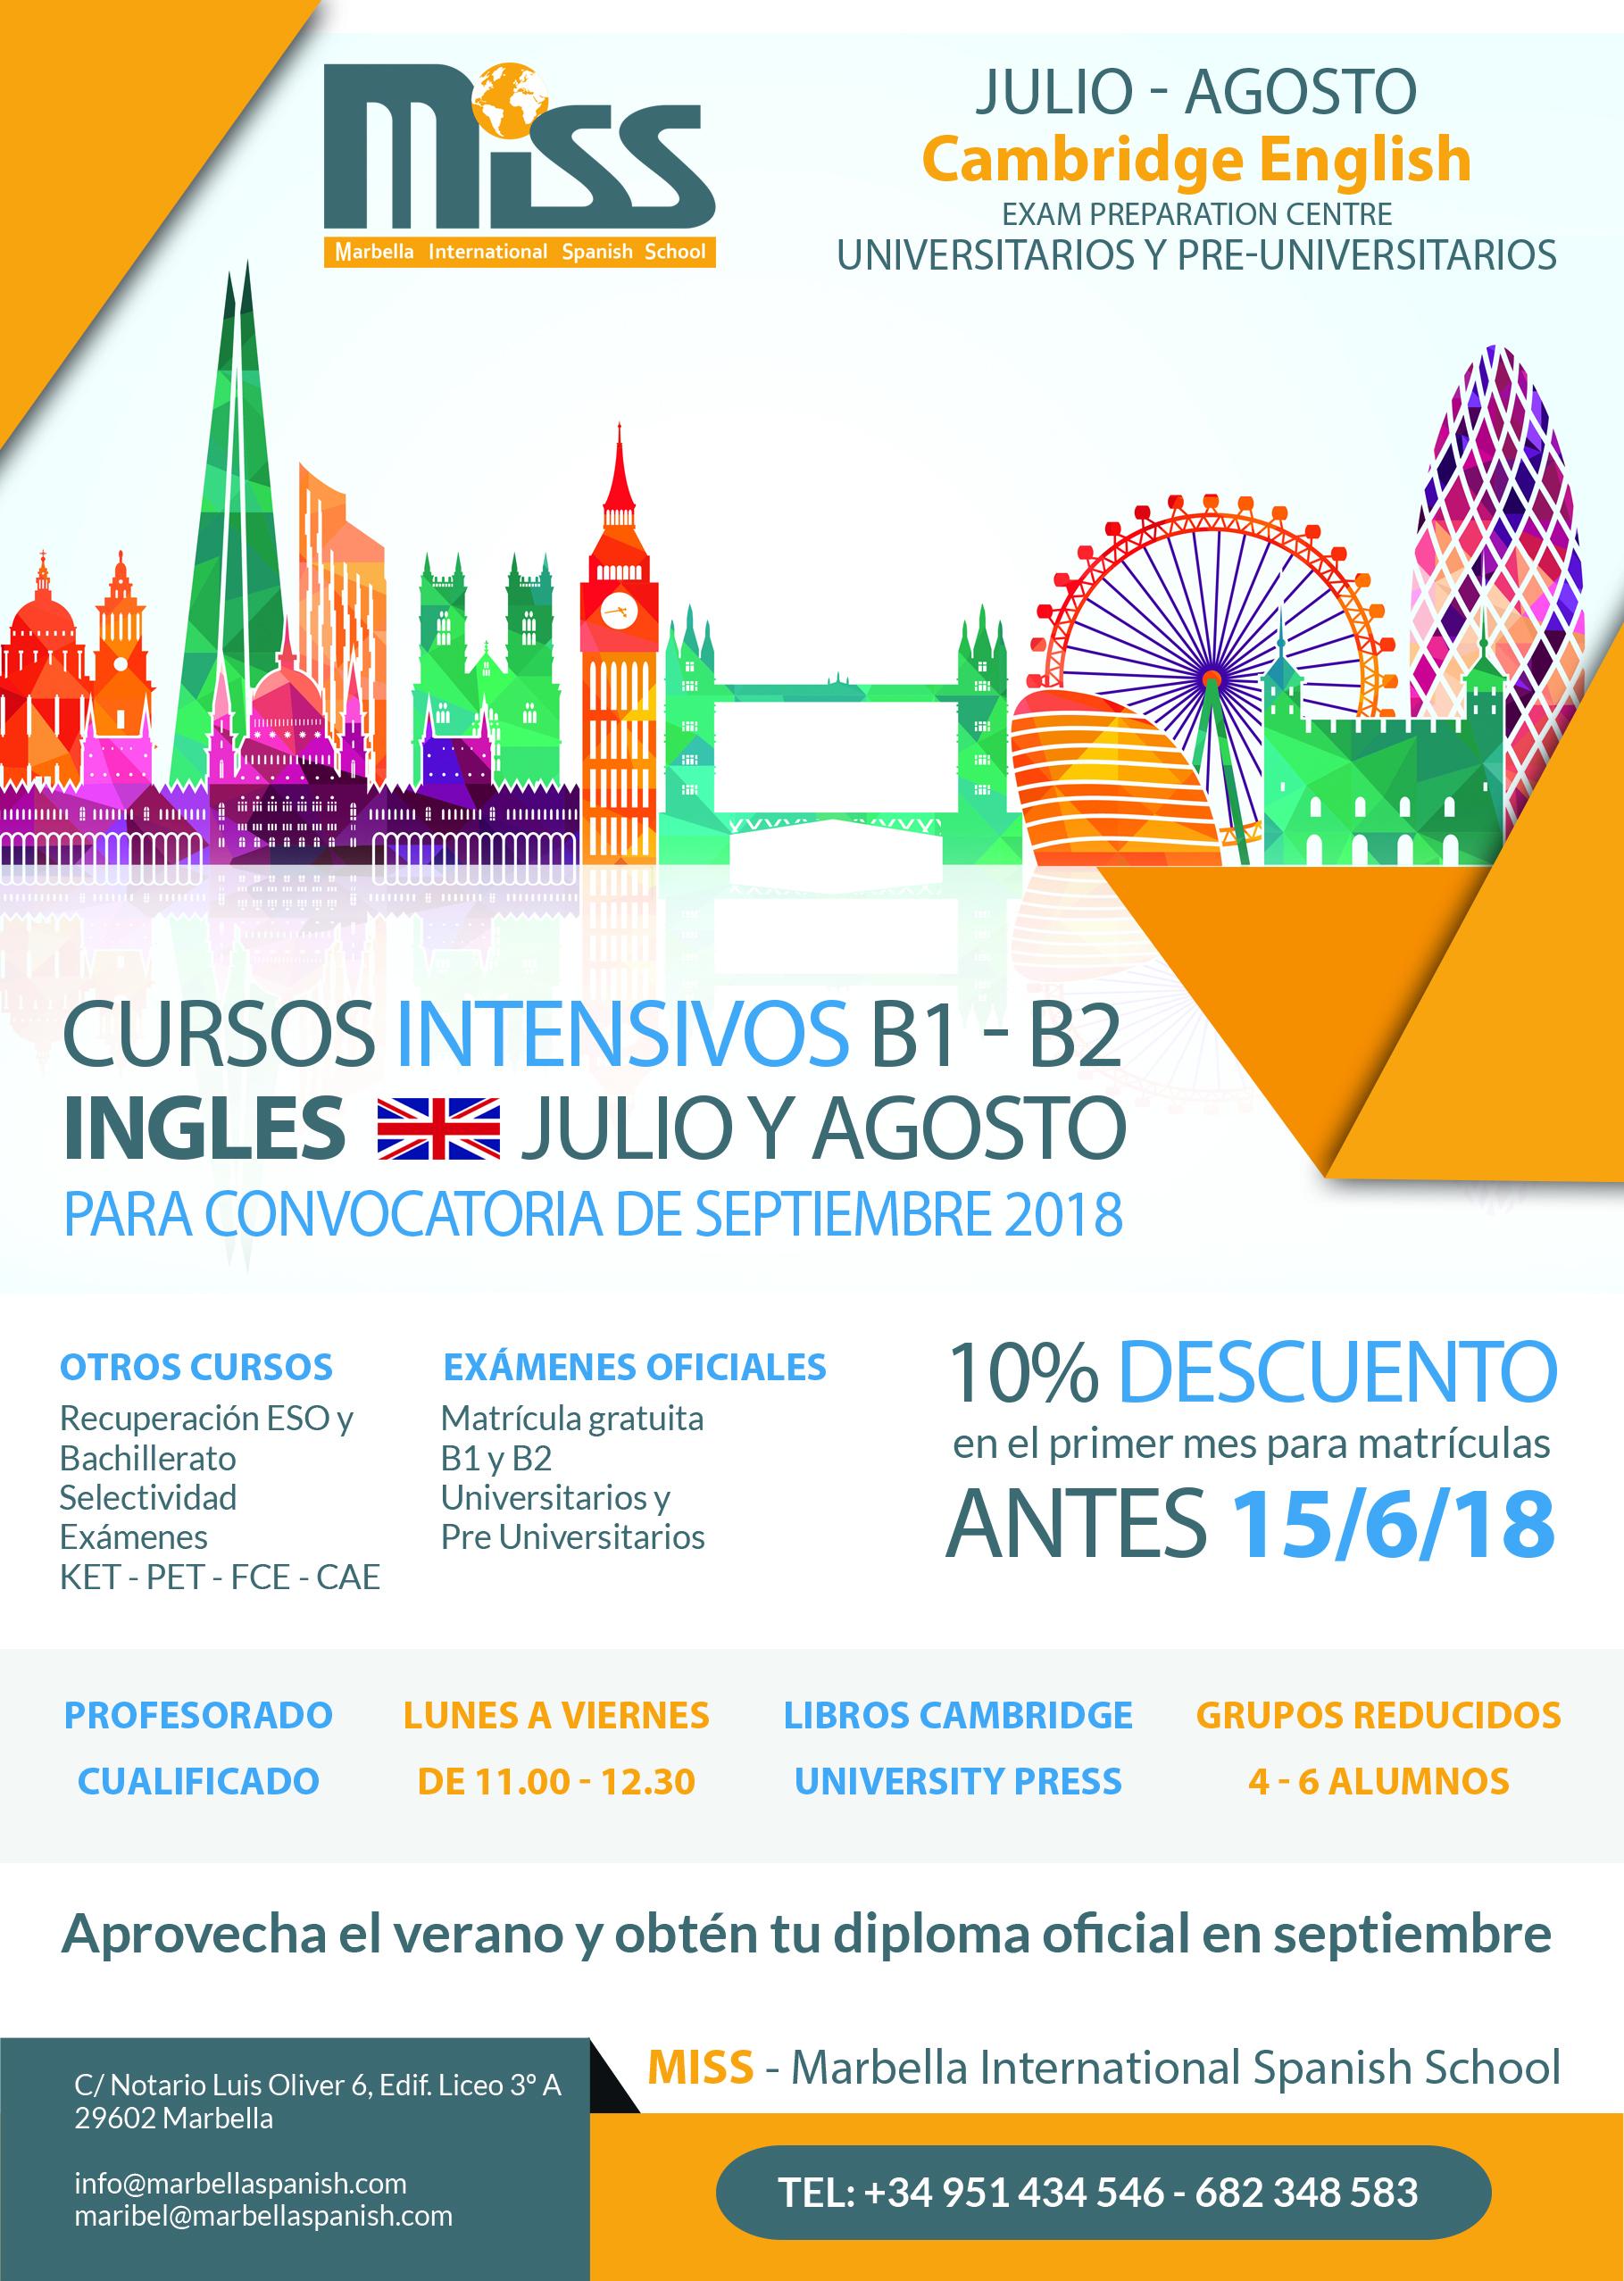 Cursos intensivos B14 & B2 Coursos de Ingles Marbella